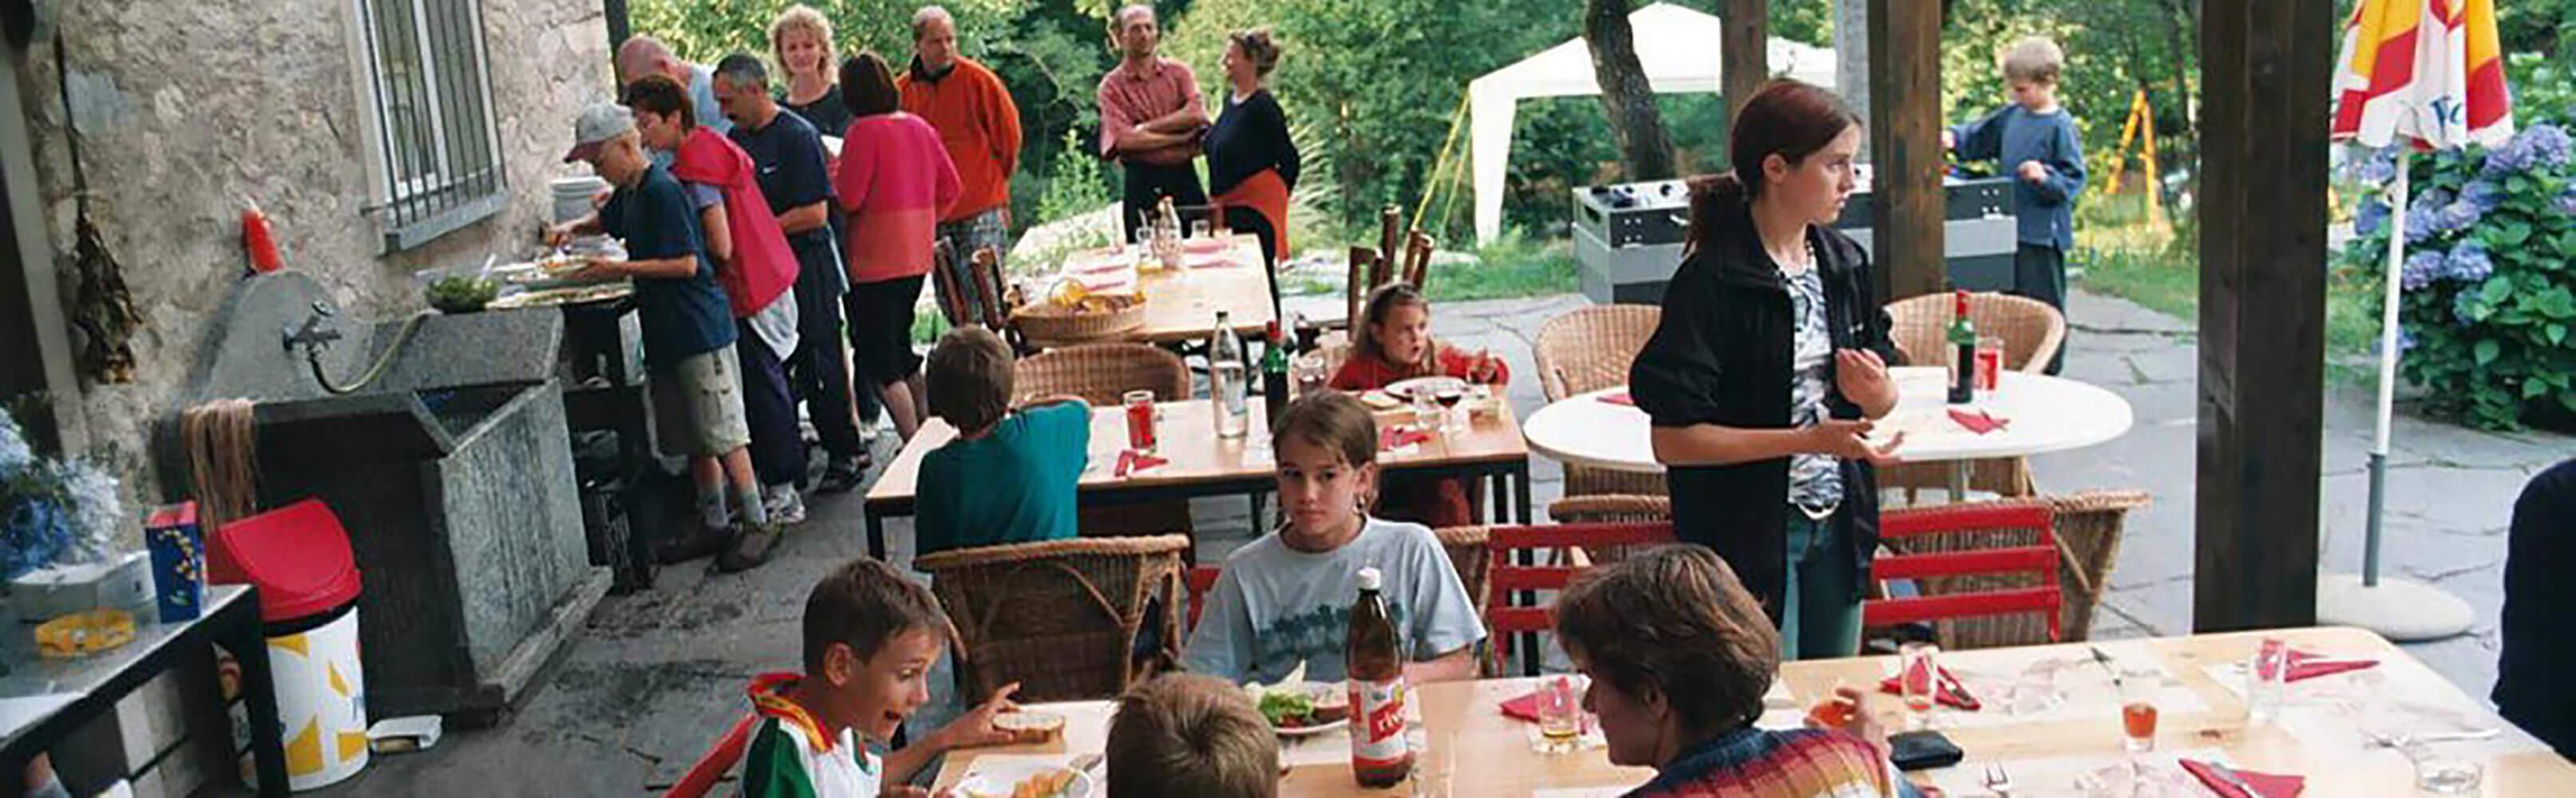 Familiencampingferien im Grünen 1